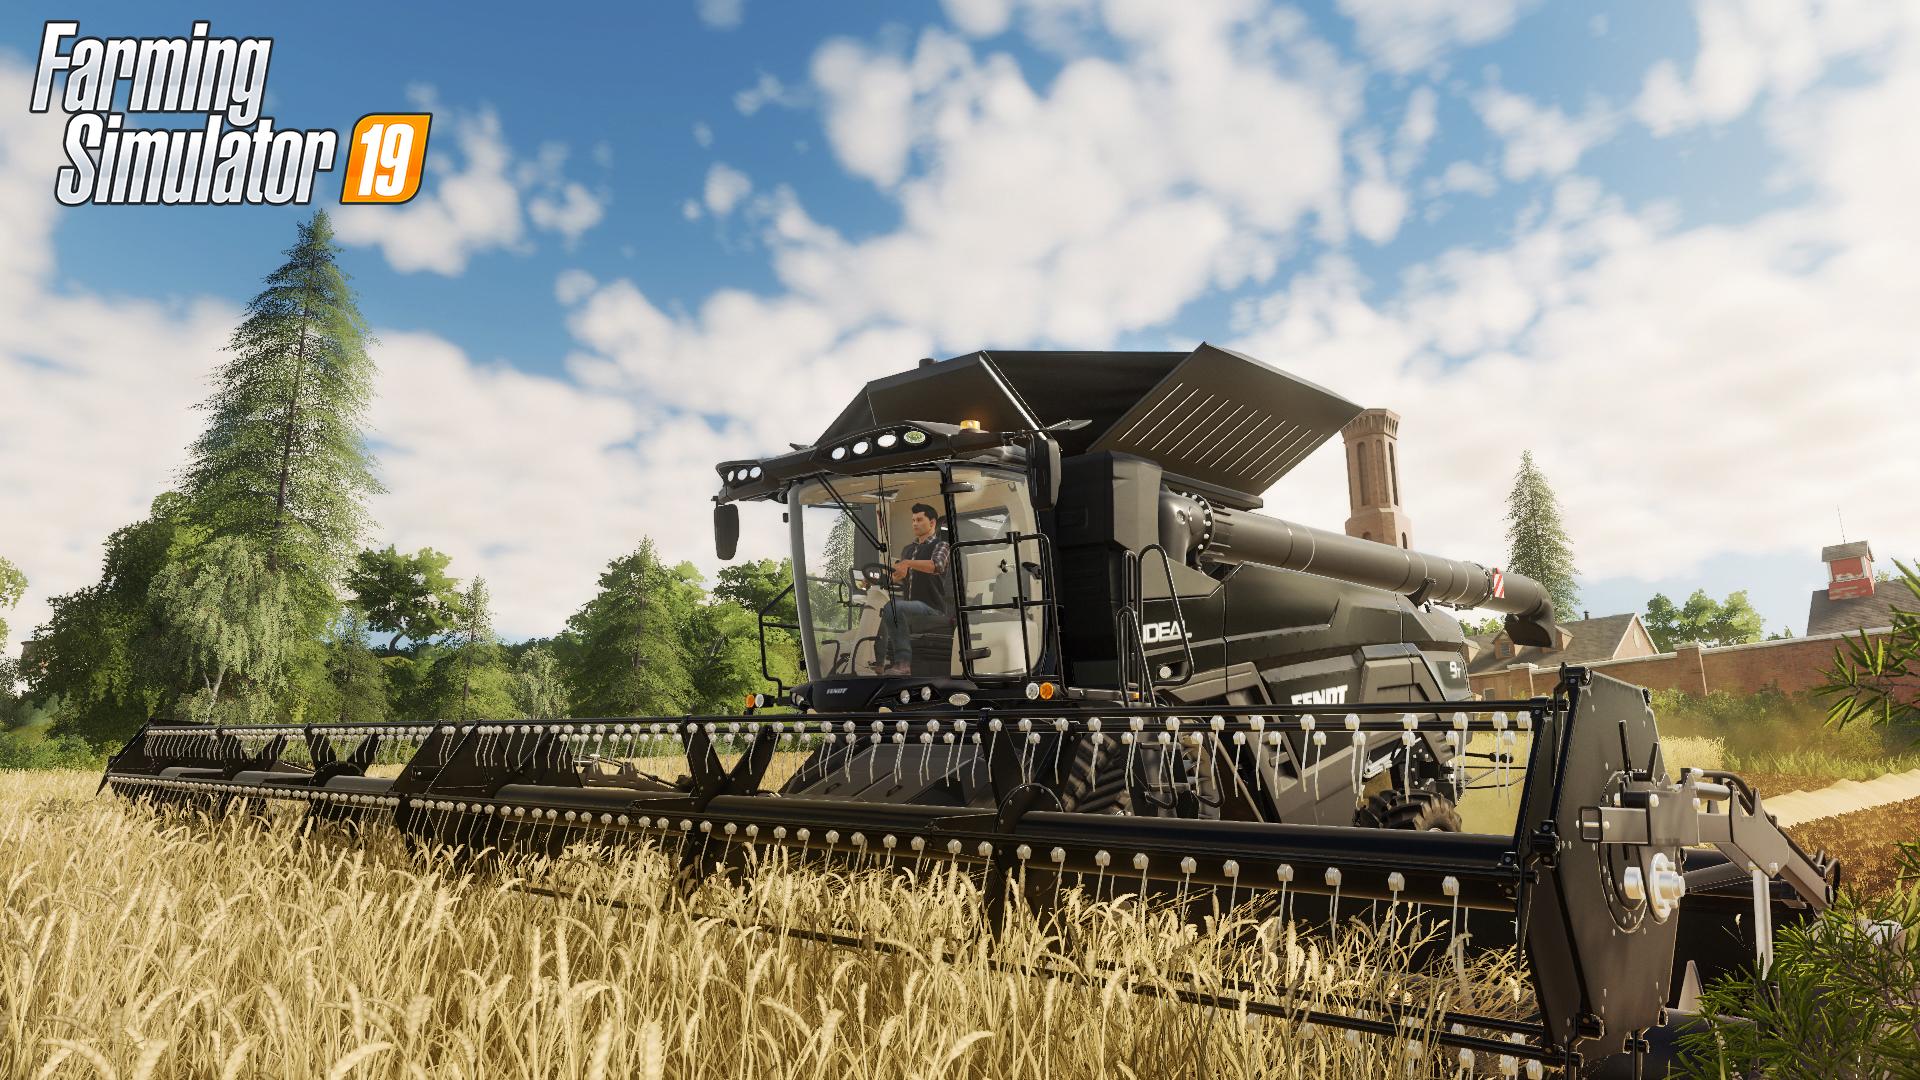 Farming Simulator 19 Background Image In HD PaperPull 1920x1080